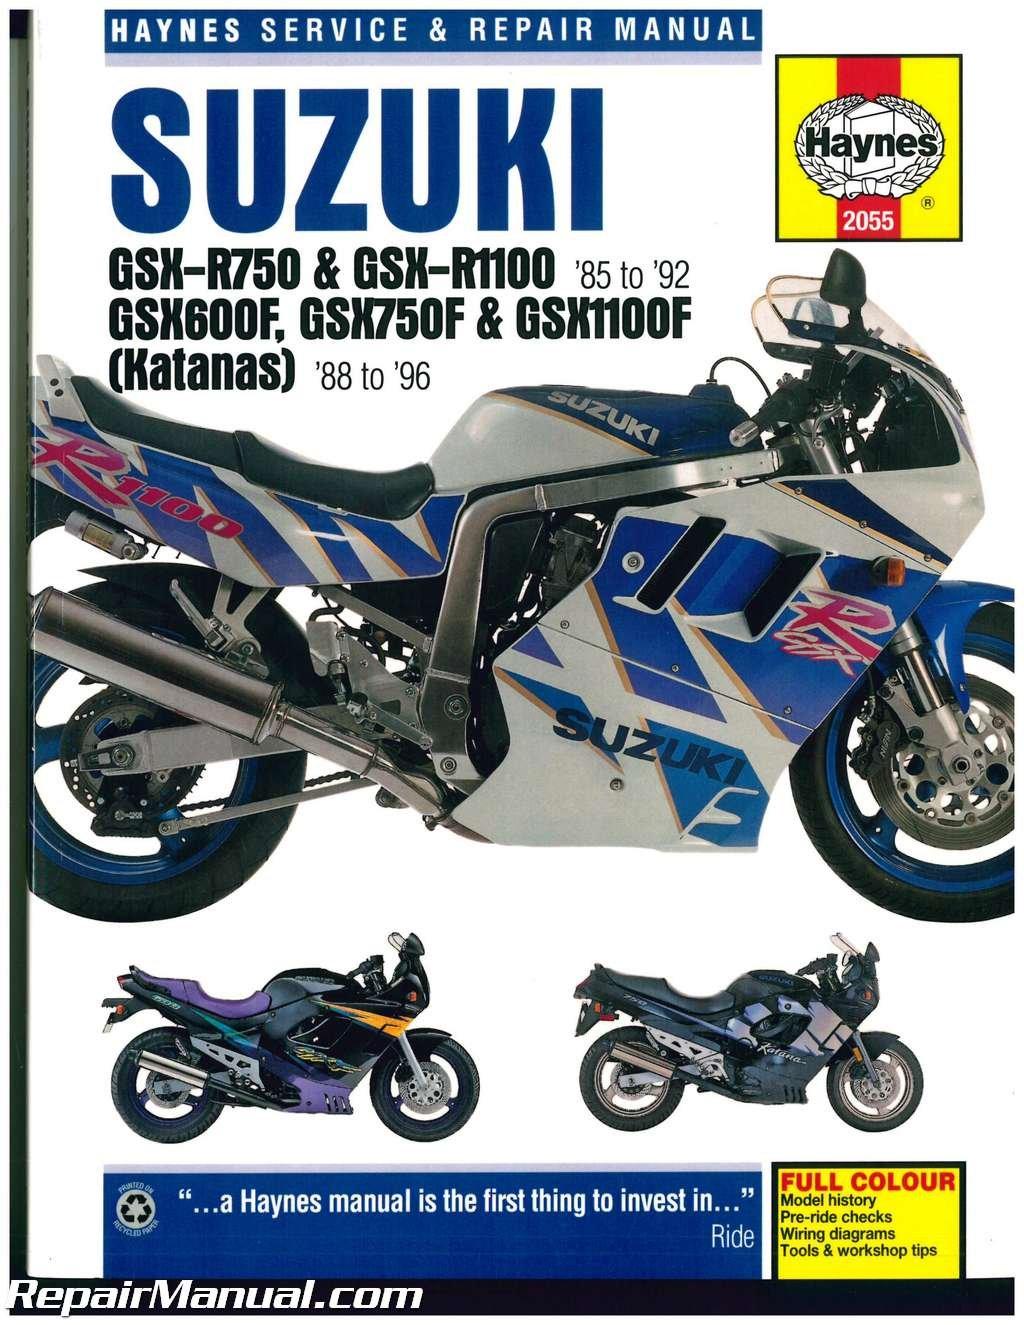 h2055 haynes suzuki gsx-r 750, gsx-r 1100 1985-1992 katana 600 750 1100  1988-1996 motorcycle repair manual paperback – 2004